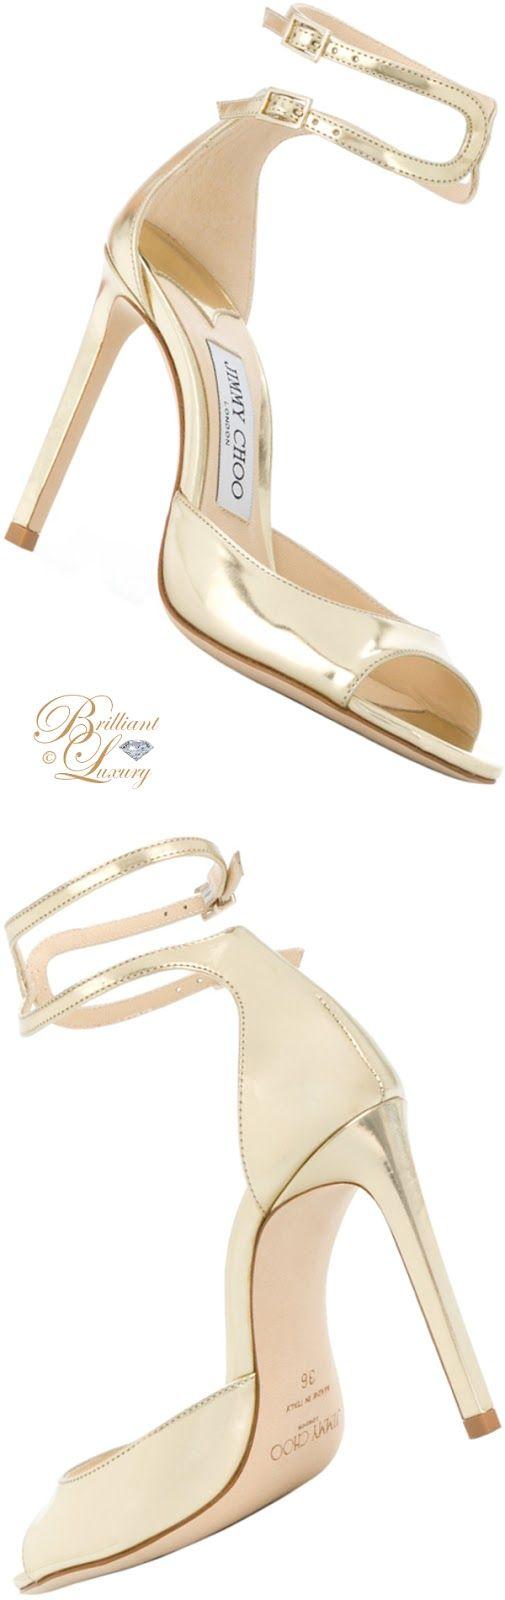 Brilliant Luxury ♦ Jimmy Choo Lane sandal